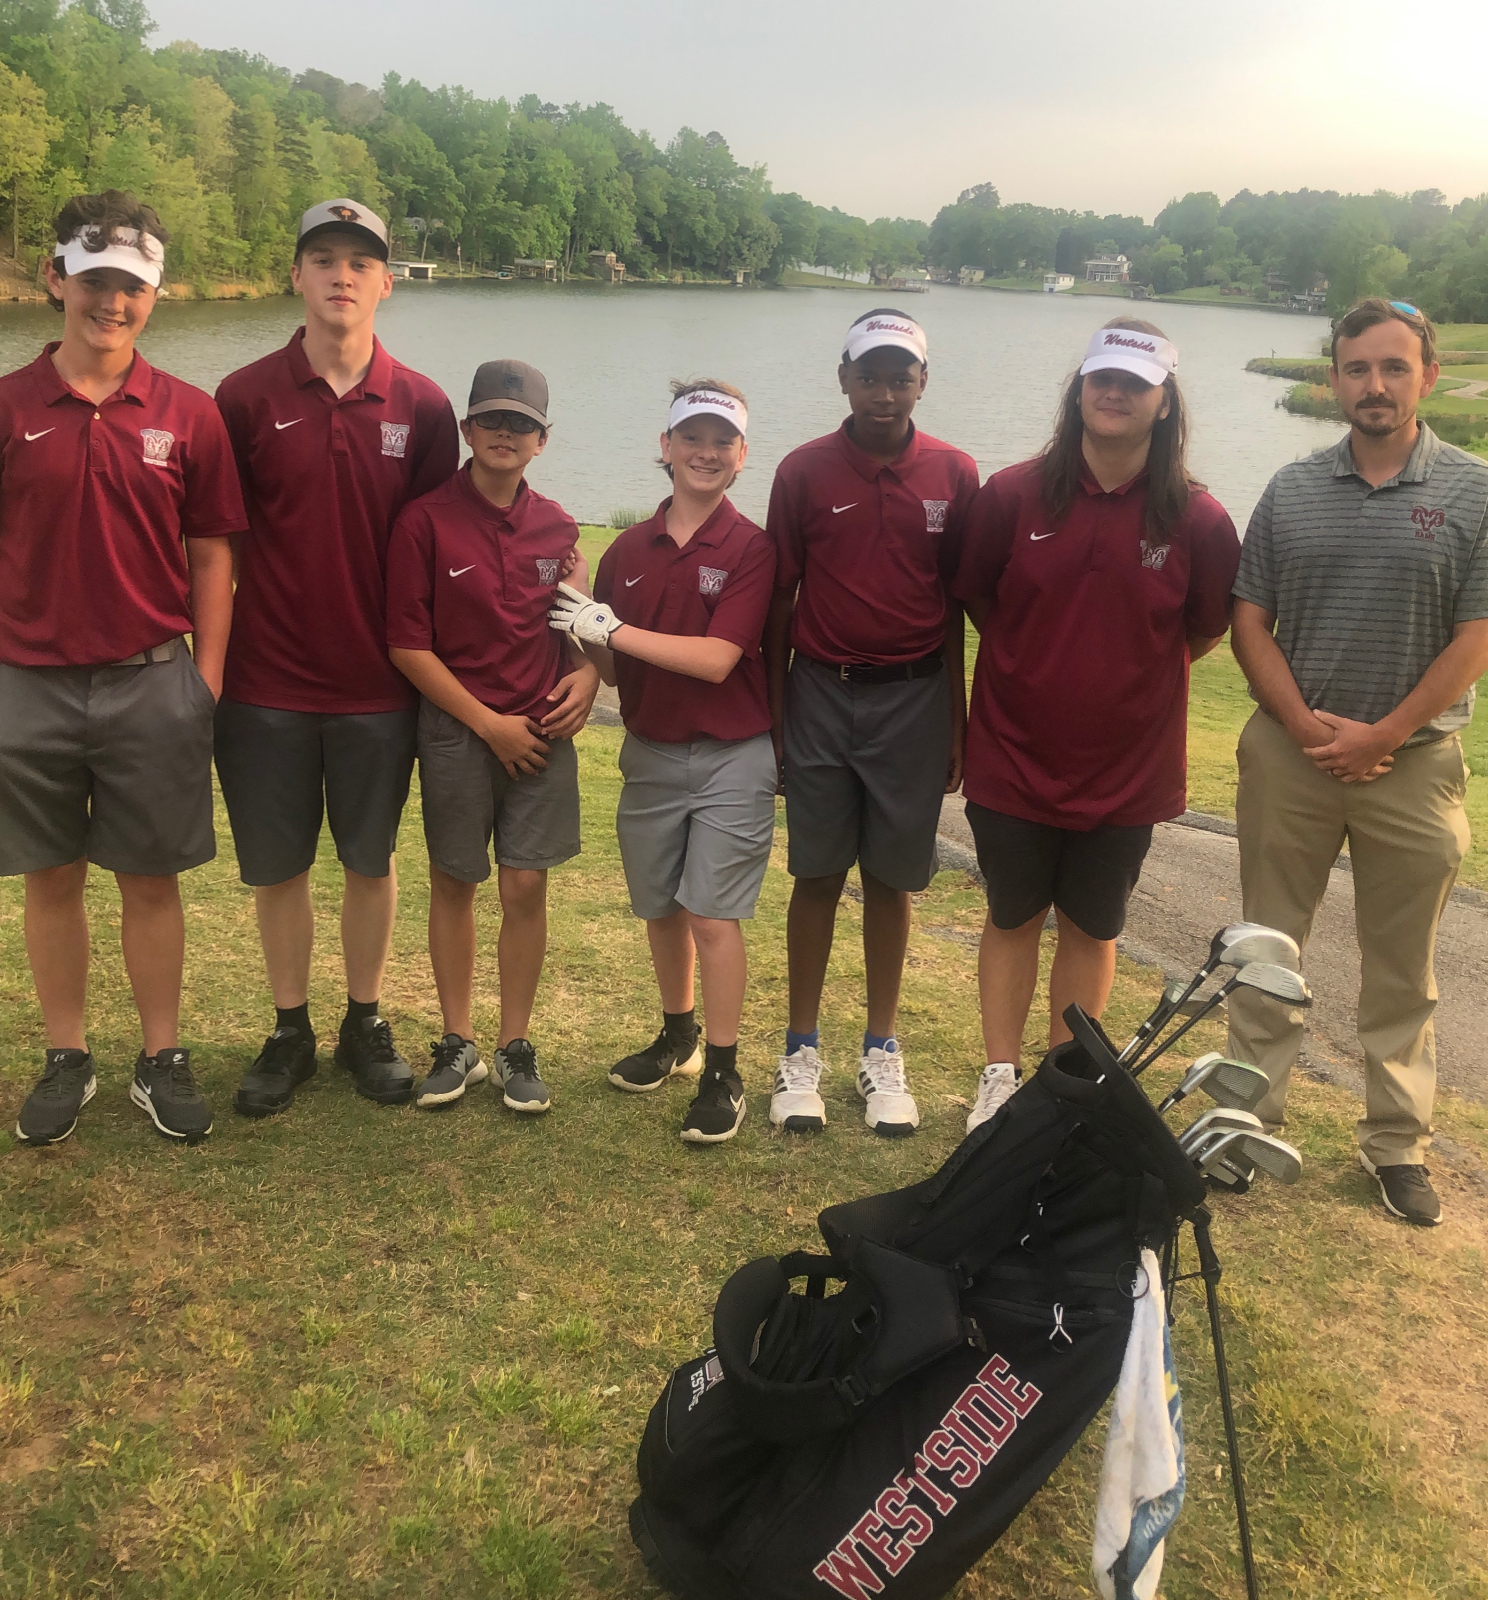 JV Wins First Golf Match In Westside History